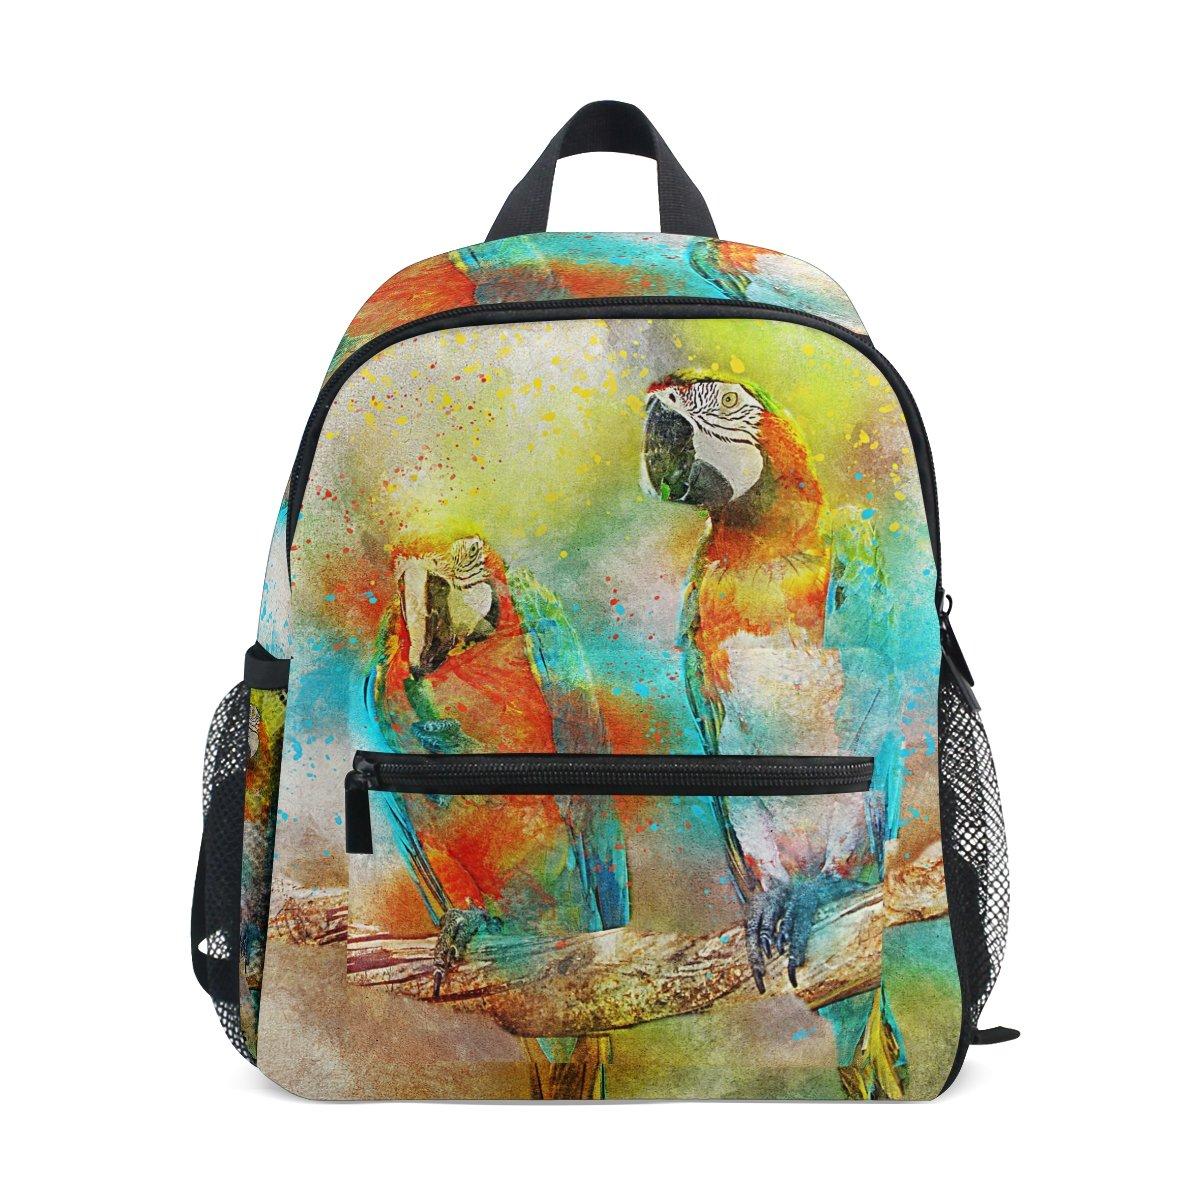 MUOOUM Colorful Bird Parrot Art Painting Kids Backpack Pre-School Toddler Bag Travel Daypack for Boys Girls